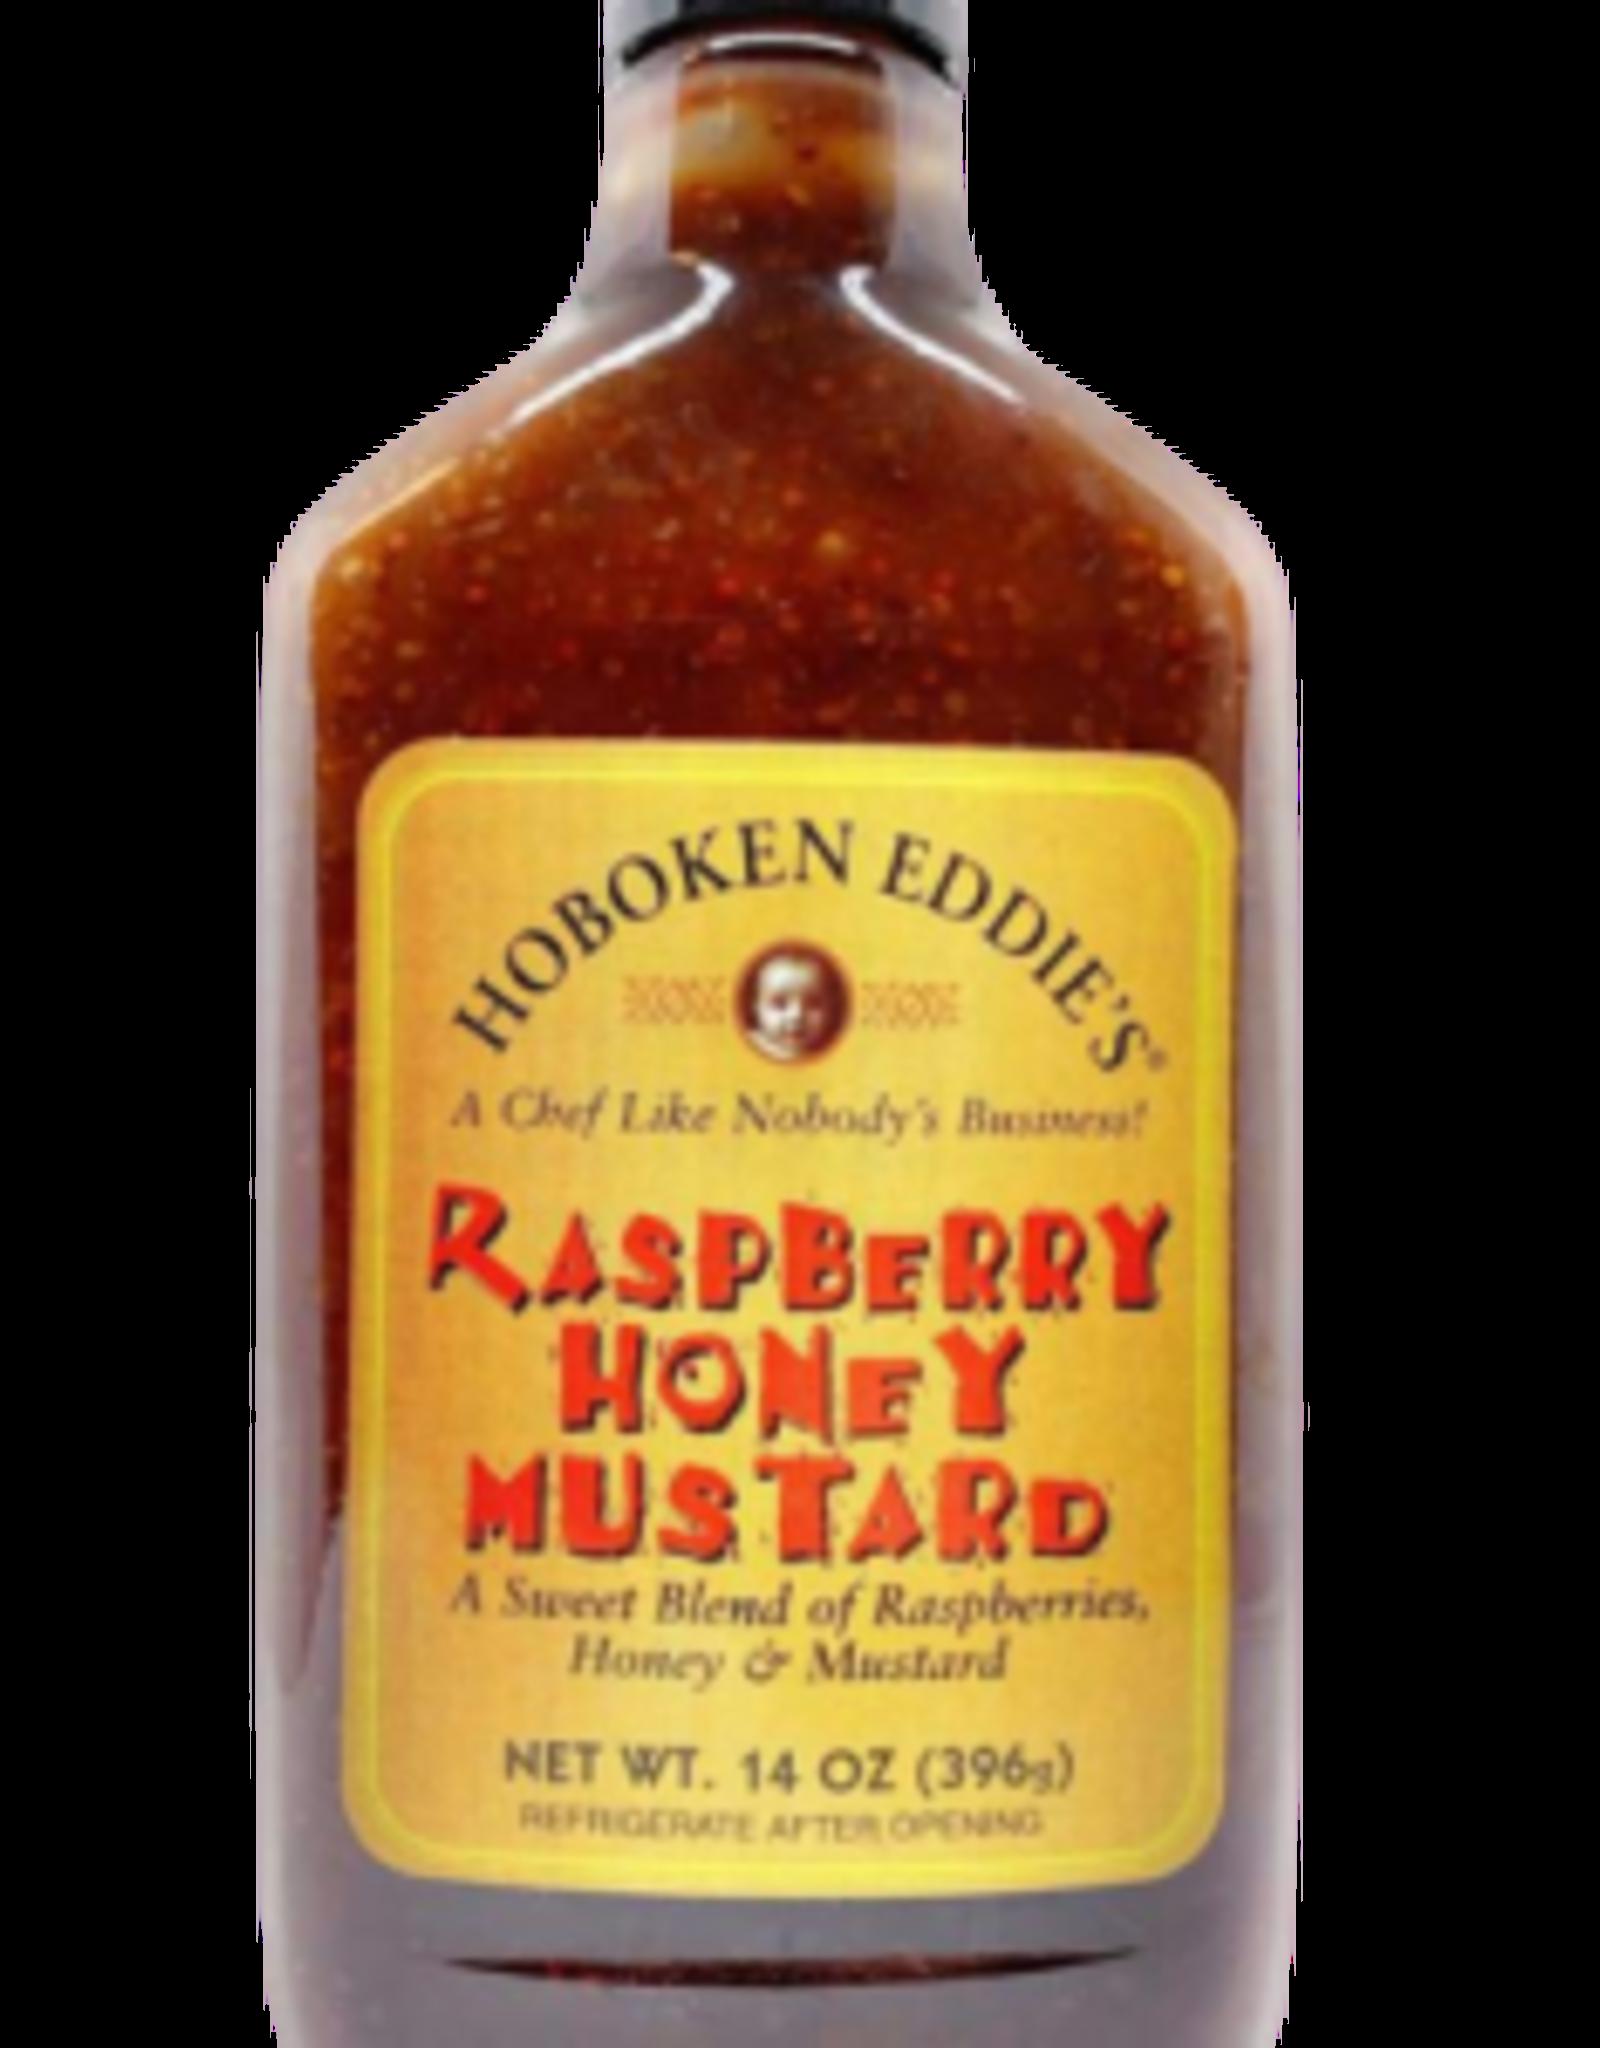 Hoboken Eddie's Raspberry Honey Mustard